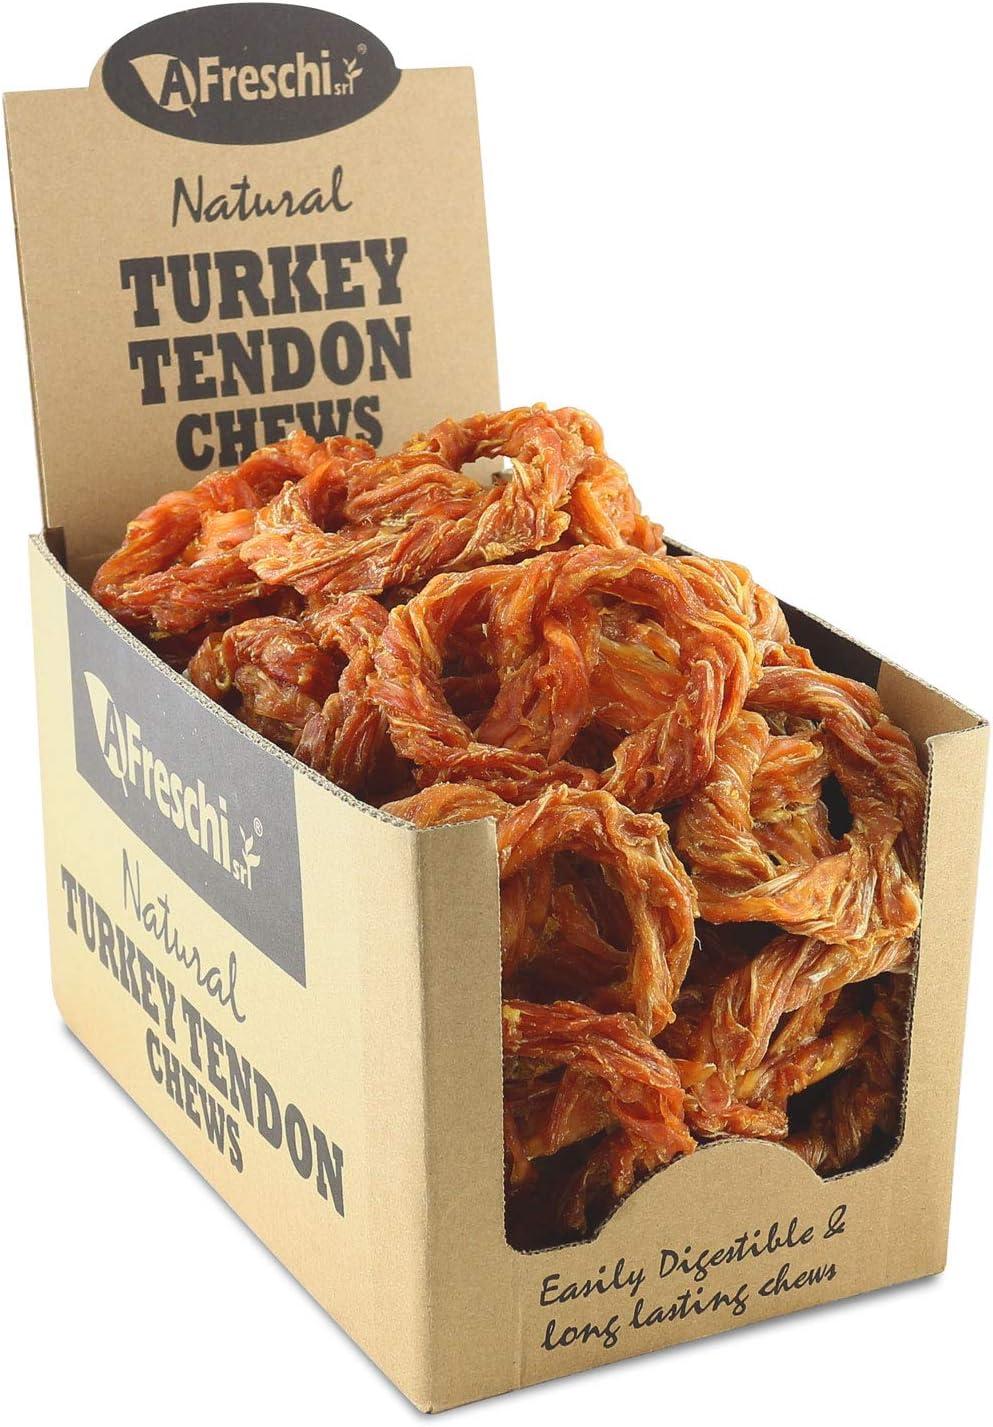 depot Omaha Mall AFreschi Turkey Tendon for Hypoallerg Dogs All-Natural Premium